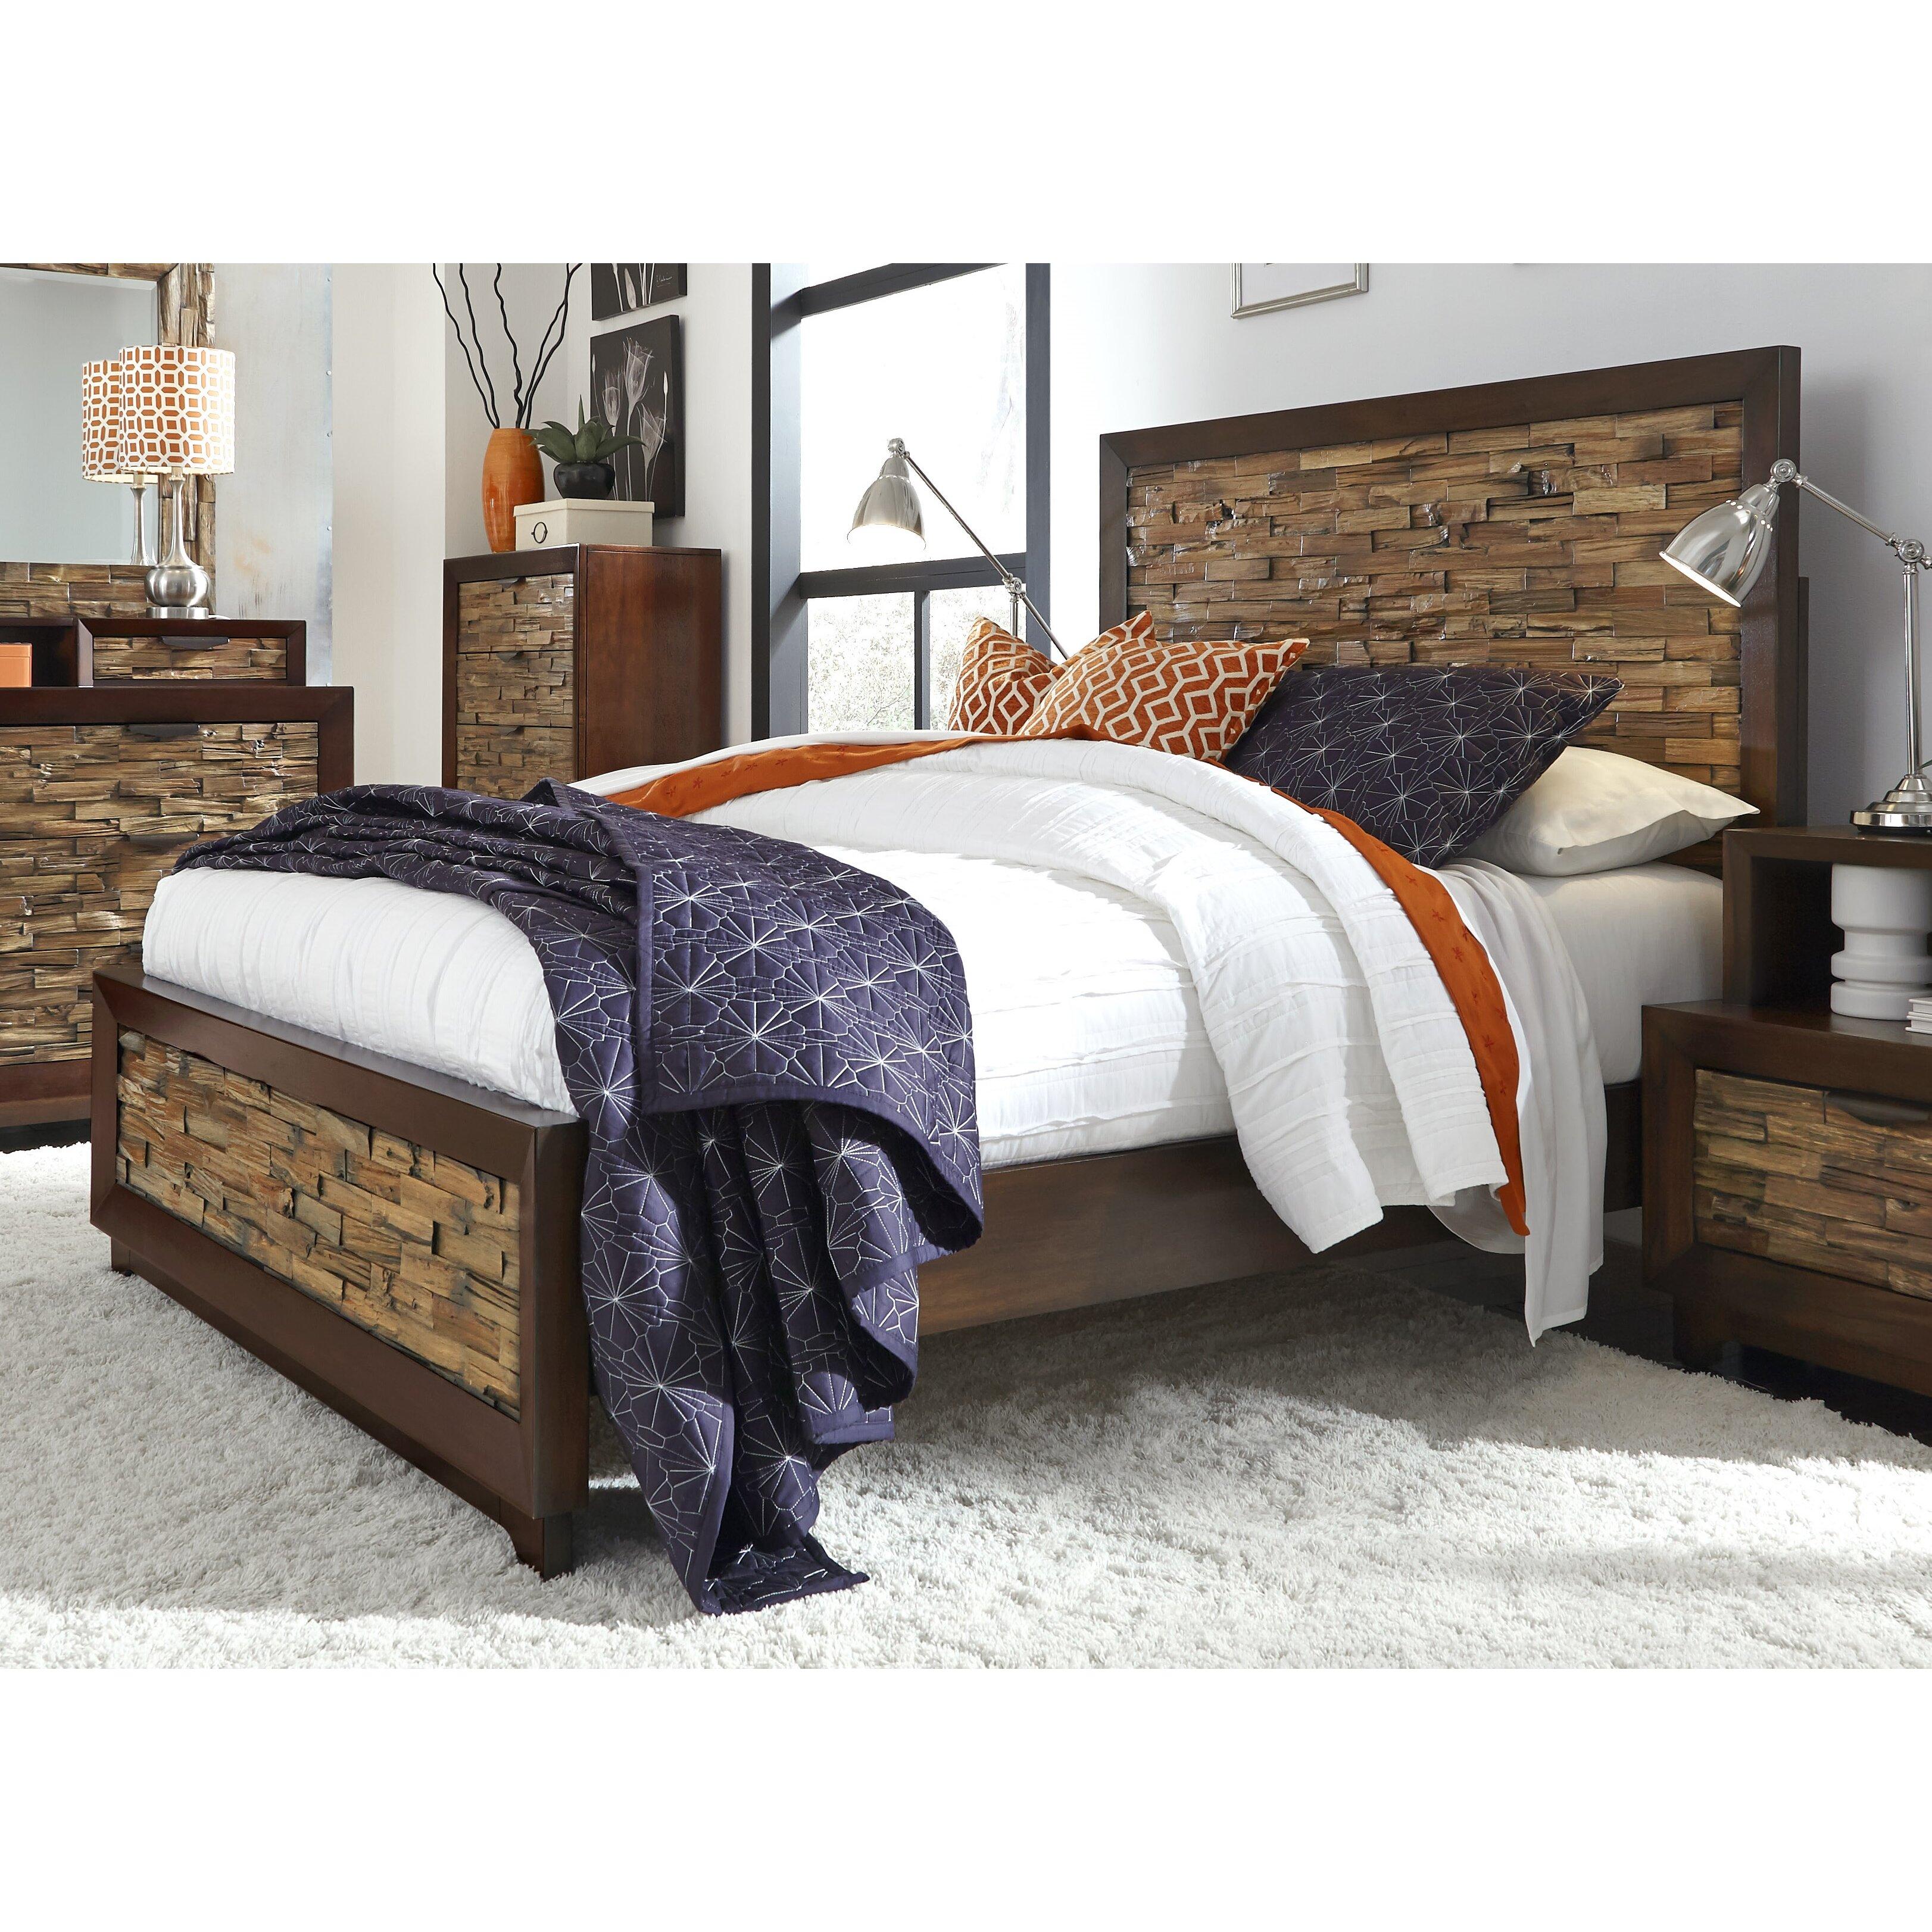 Progressive Bedroom Furniture Kingston Isle Bedroom Furniture Modroxcom